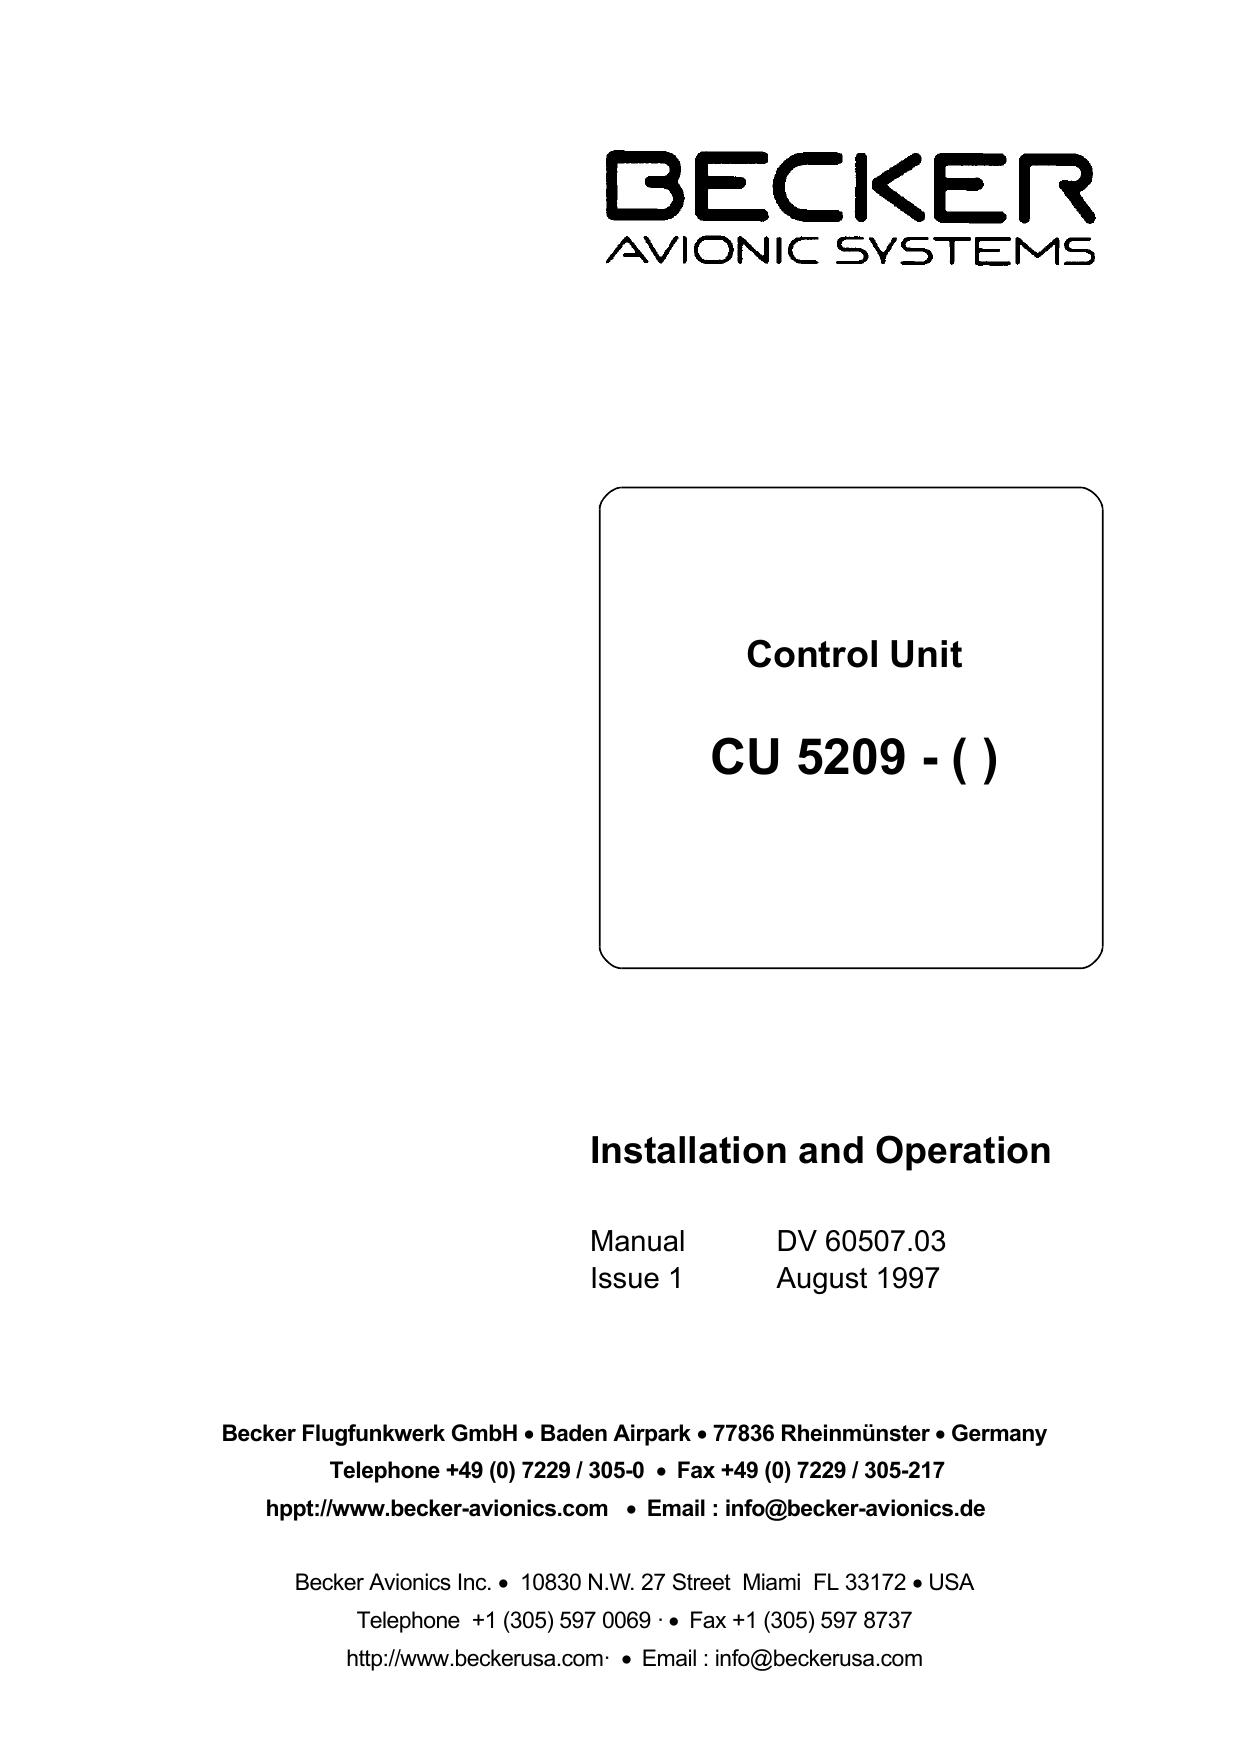 CU 5209 - Becker Avionics | manualzz com